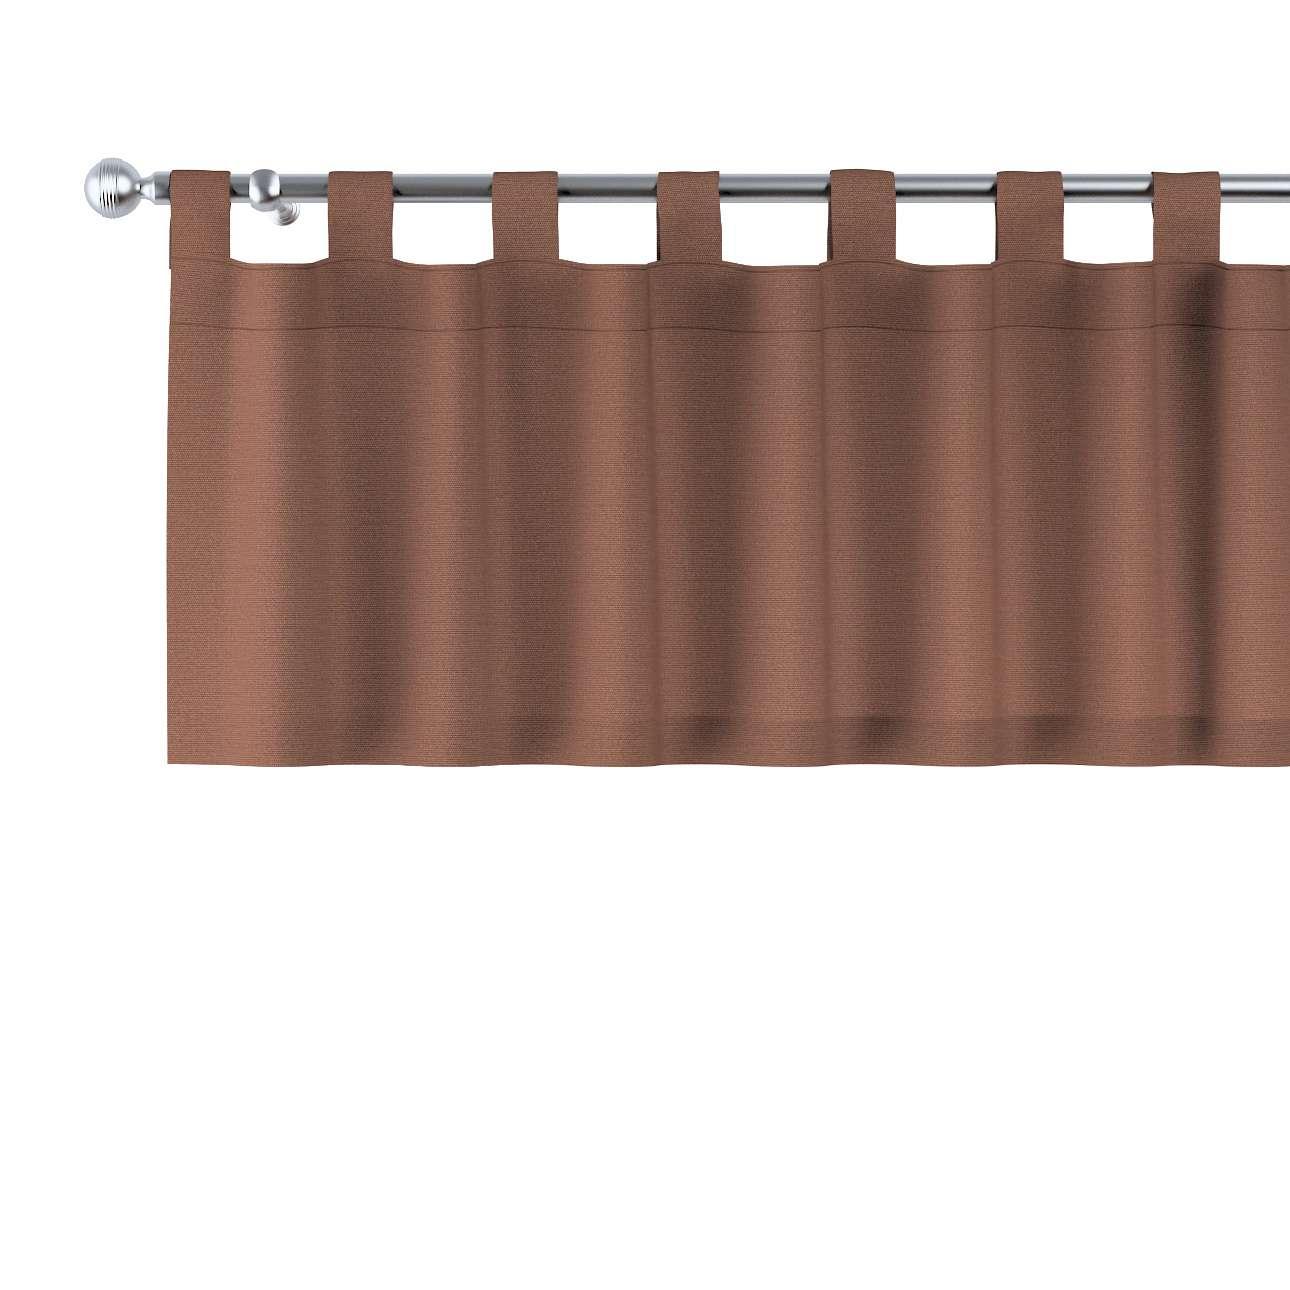 Lambrekin na szelkach w kolekcji Loneta, tkanina: 133-09